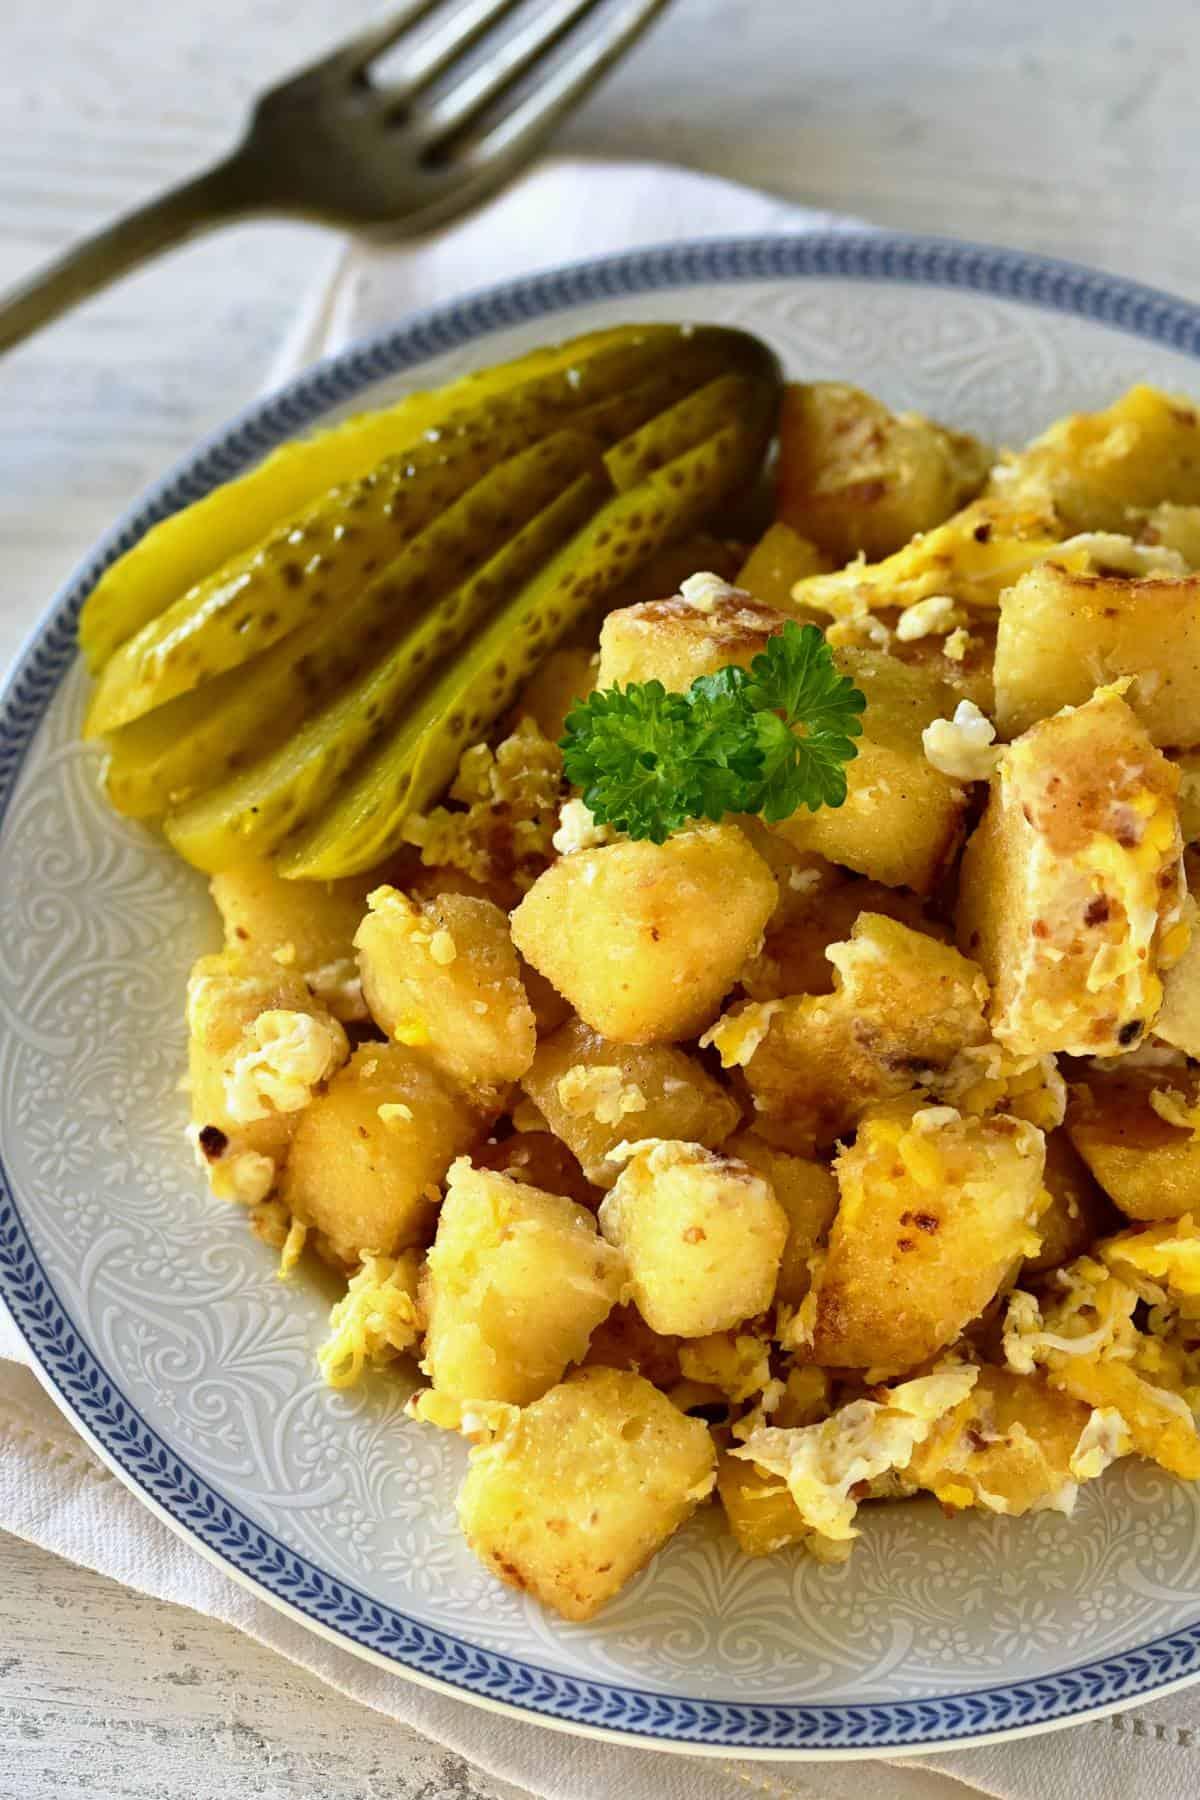 knedlíky s vejci dumplings with eggs